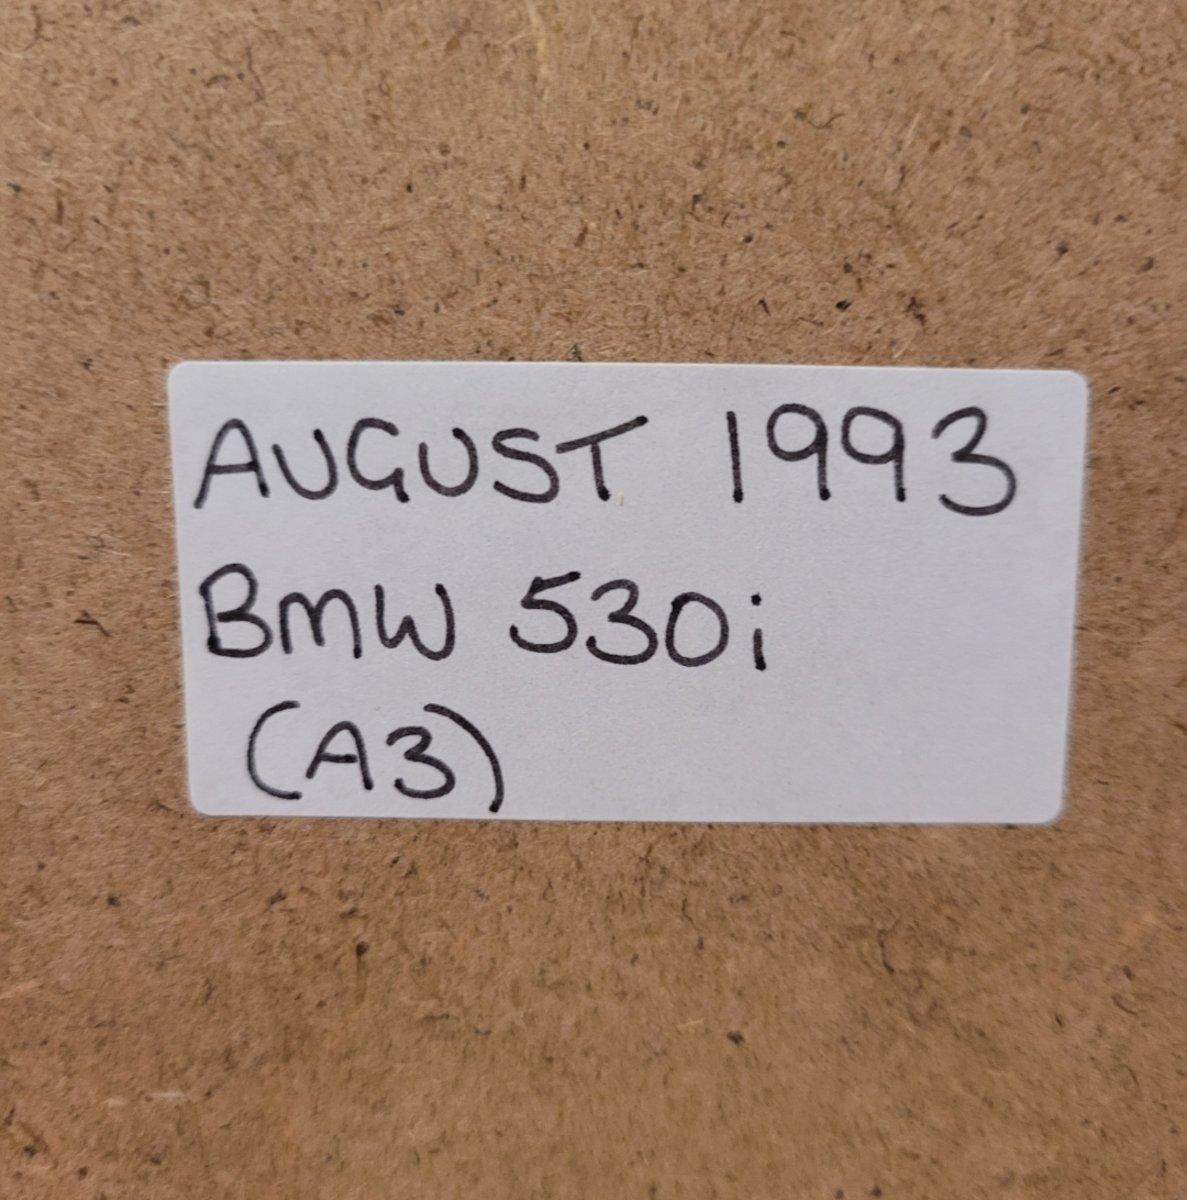 1973 Original 1993 BMW E34 530i Framed Advert For Sale (picture 2 of 3)